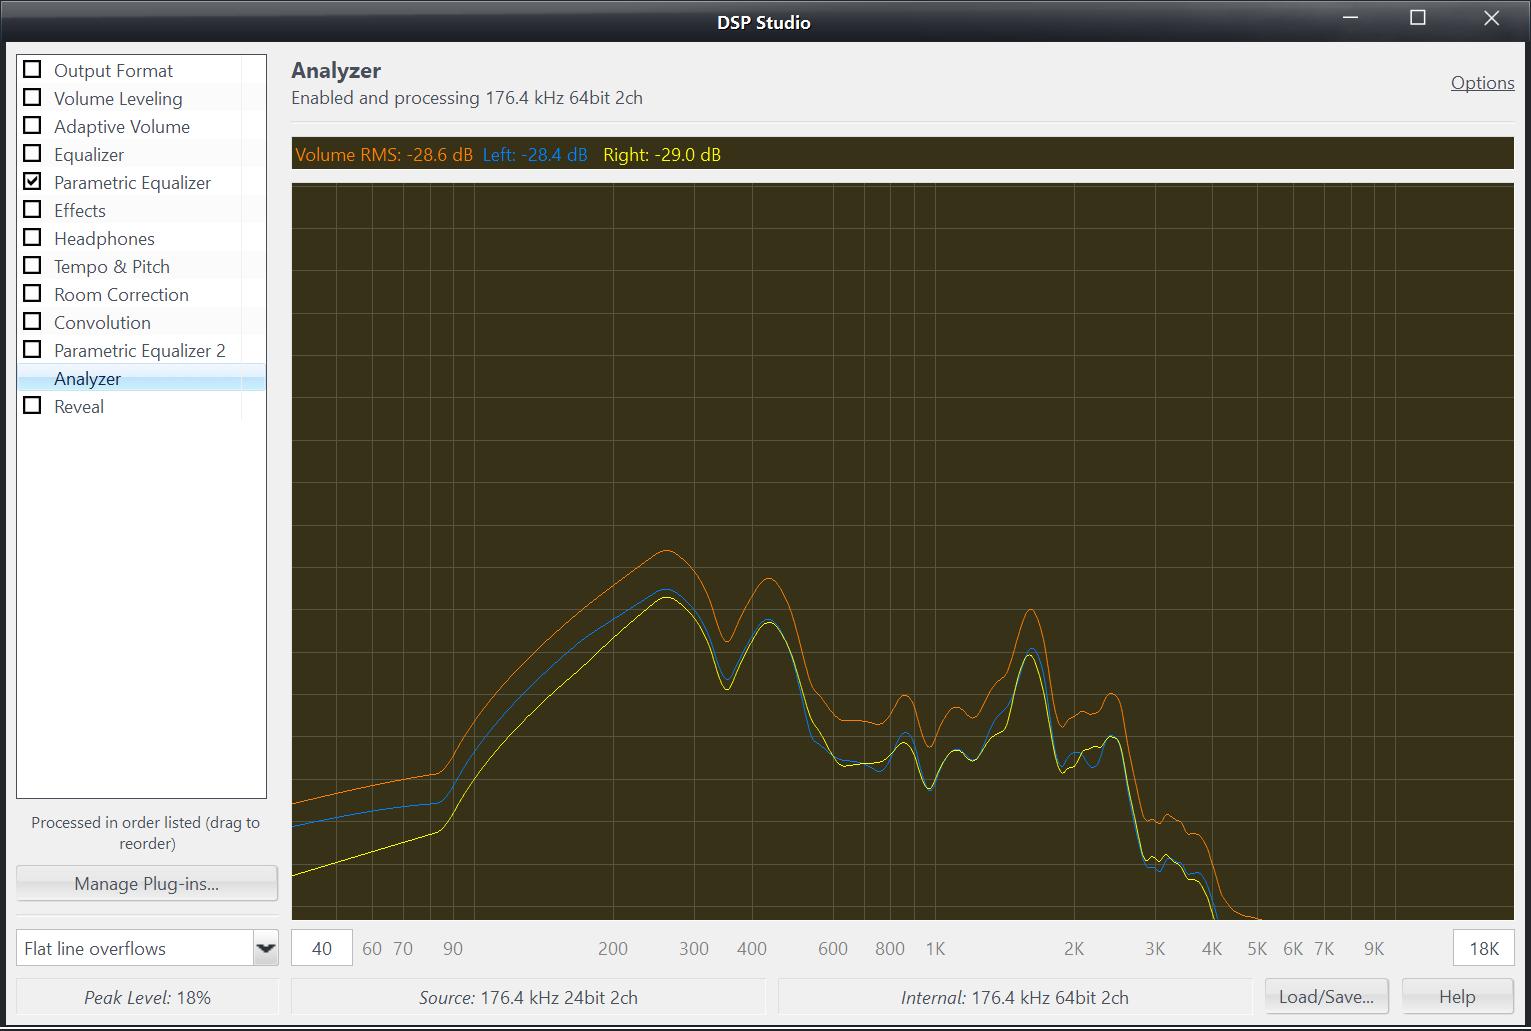 JRiver Analyzer / Visualization | Headphone Reviews and